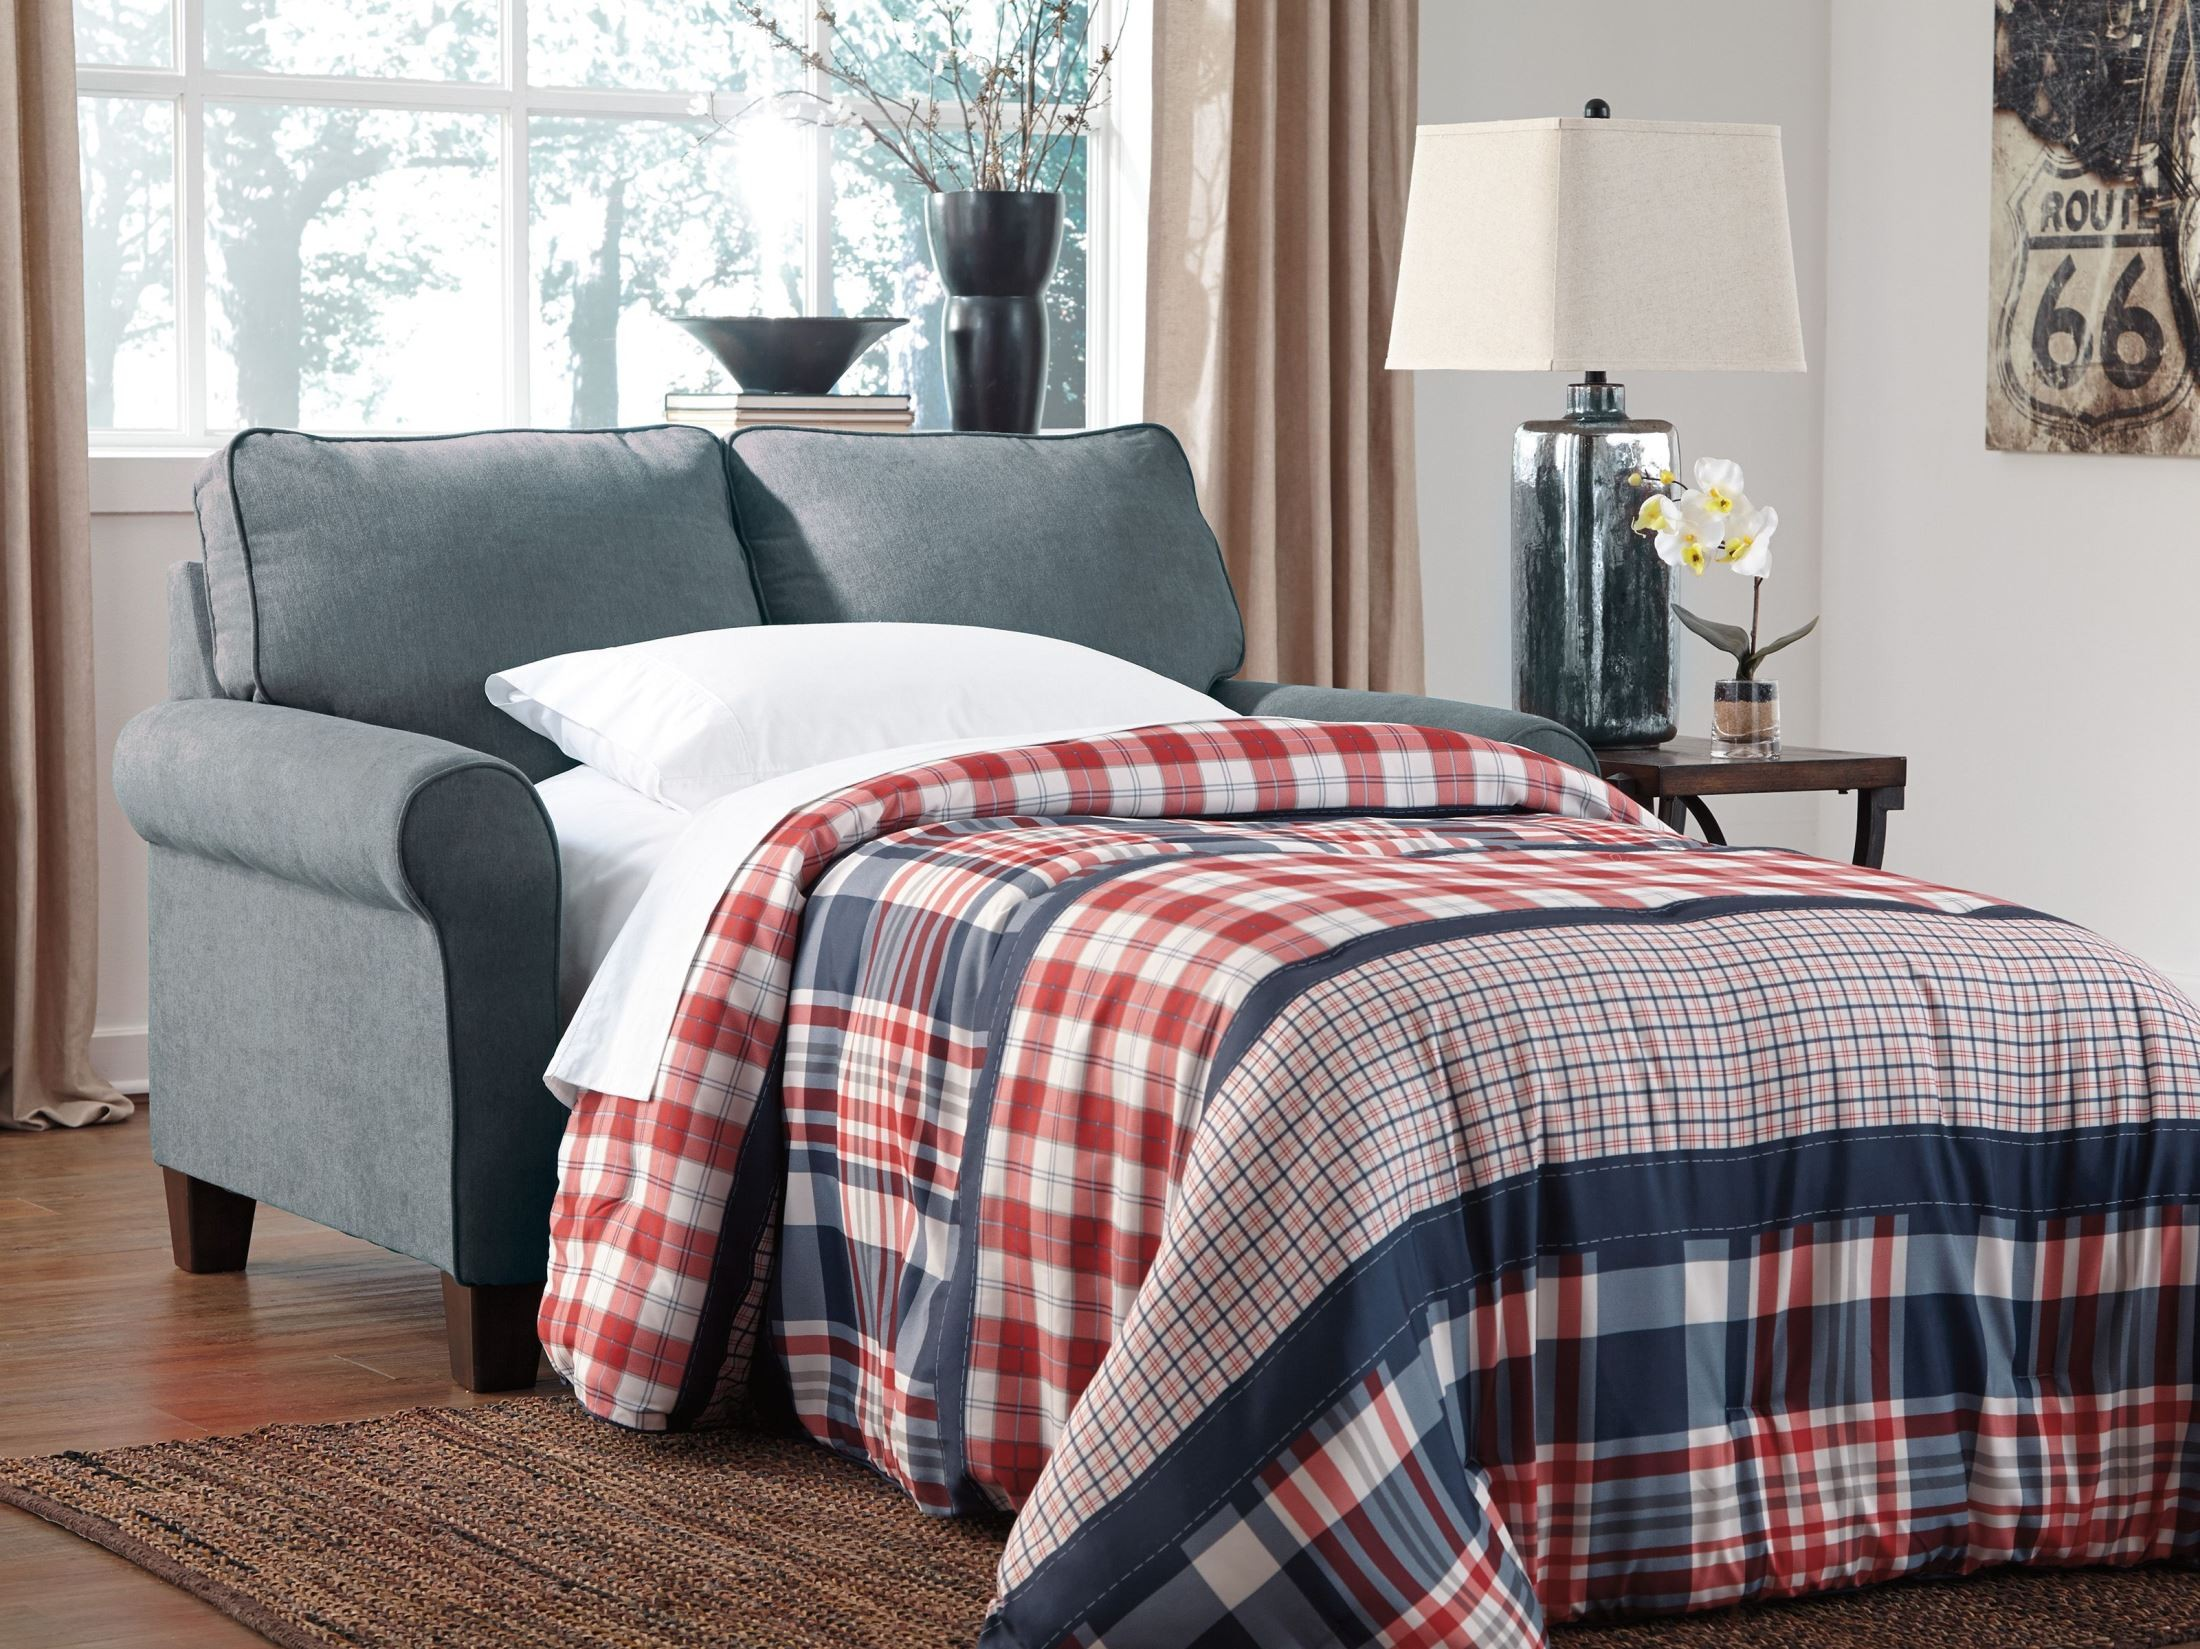 zeth denim twin sofa sleeper from ashley 2710137 coleman furniture. Black Bedroom Furniture Sets. Home Design Ideas